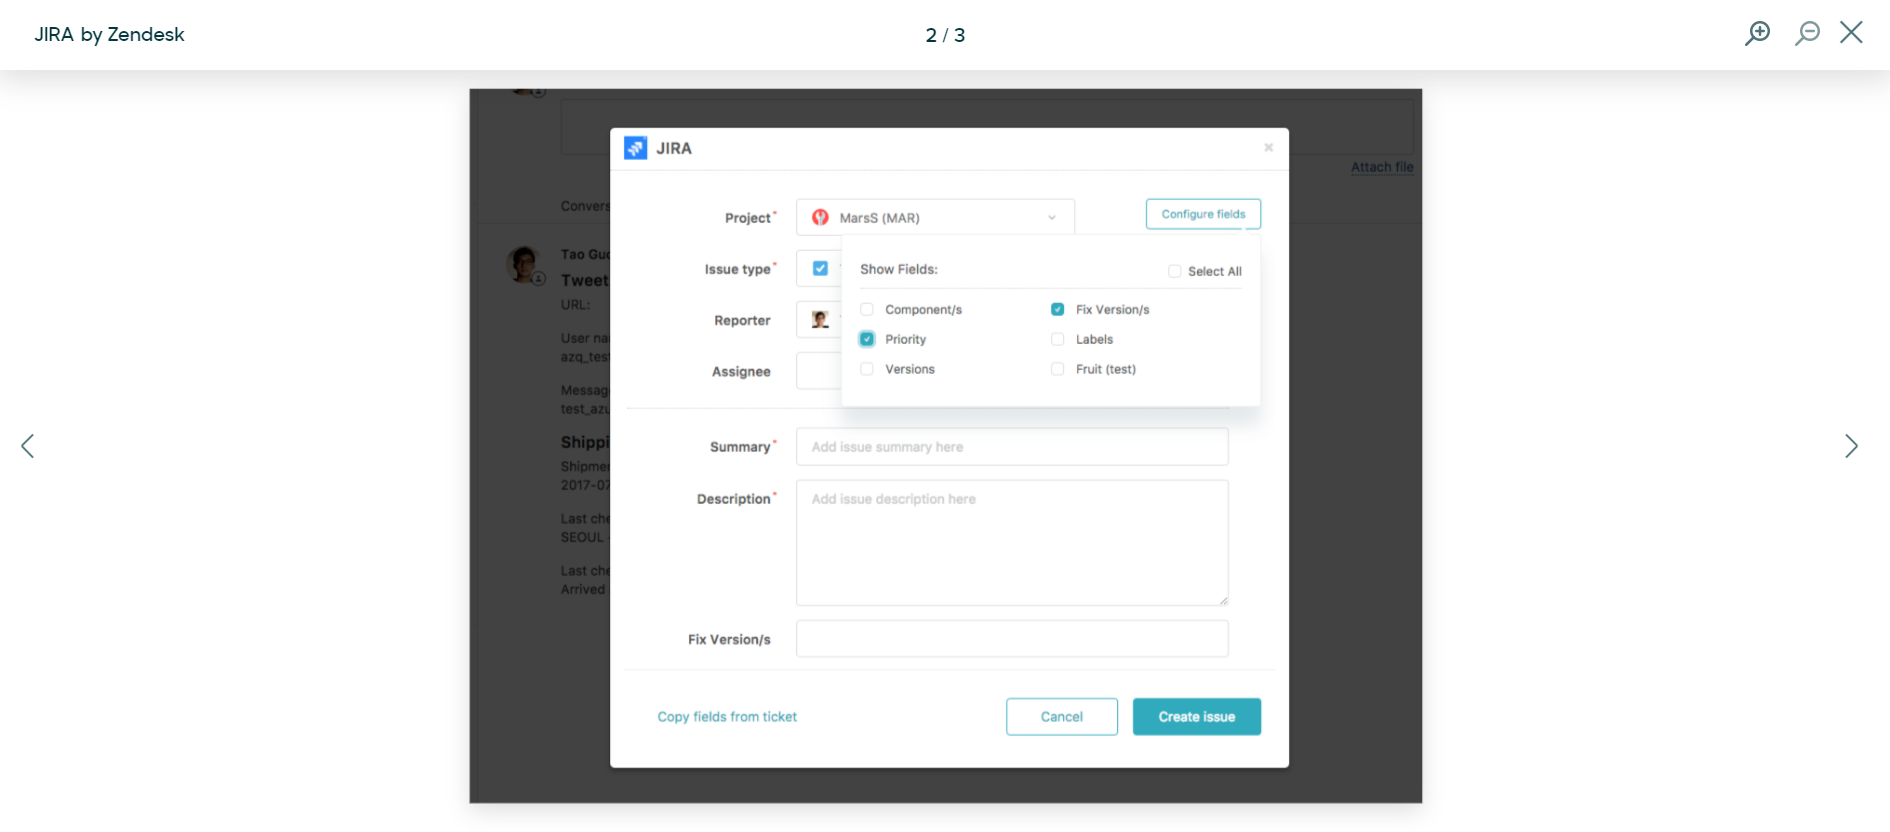 Zendesk integrations: JIRA by Zendesk